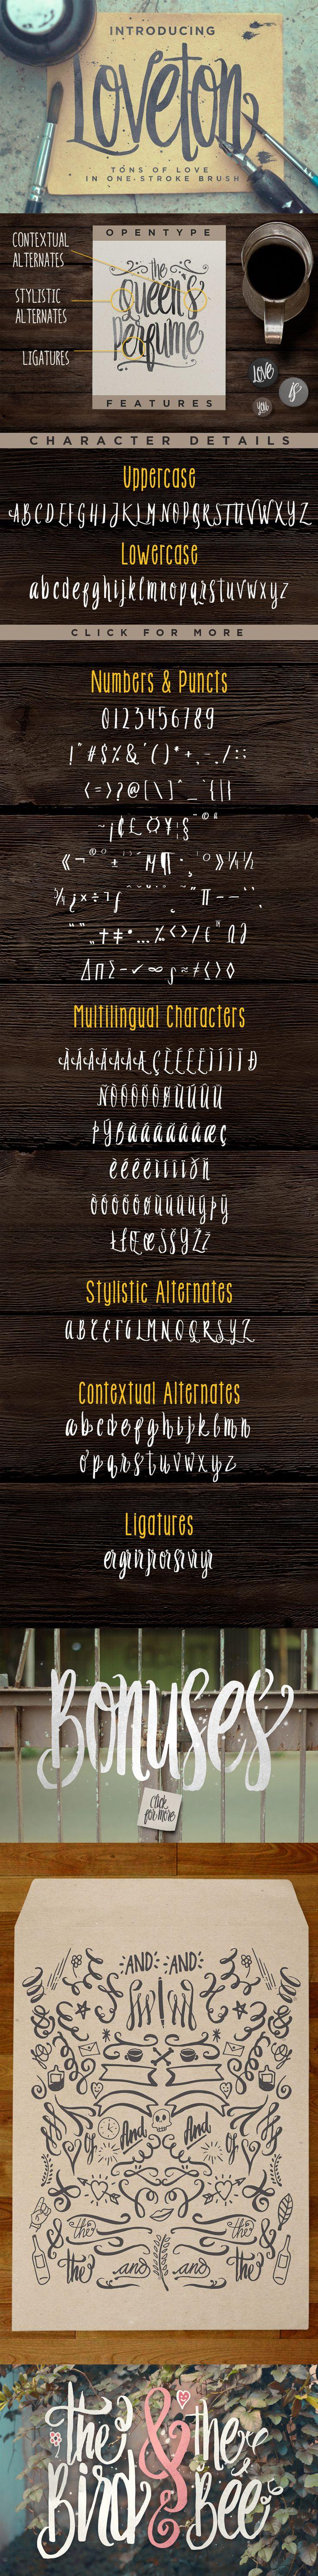 Loveton Typeface Font by Irwanismoyo | 22 Professional & Artistic Fonts Apr 2015